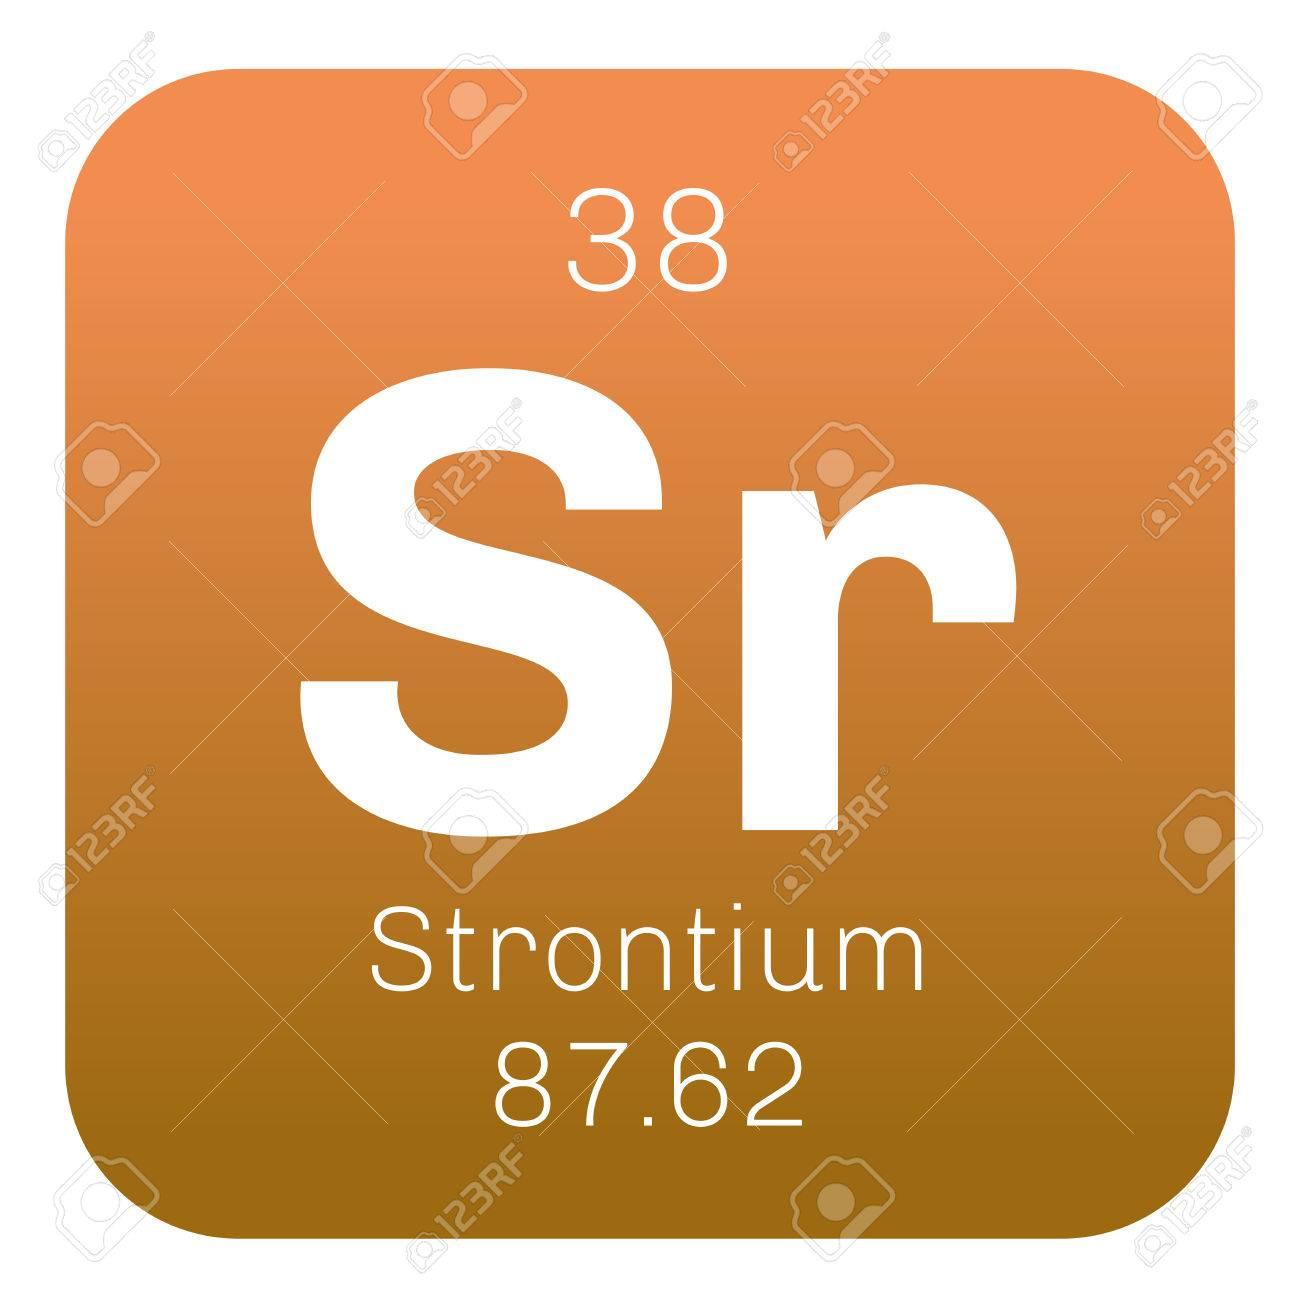 Strontium chemical element an alkaline earth metal colored strontium chemical element an alkaline earth metal colored icon with atomic number and atomic urtaz Gallery